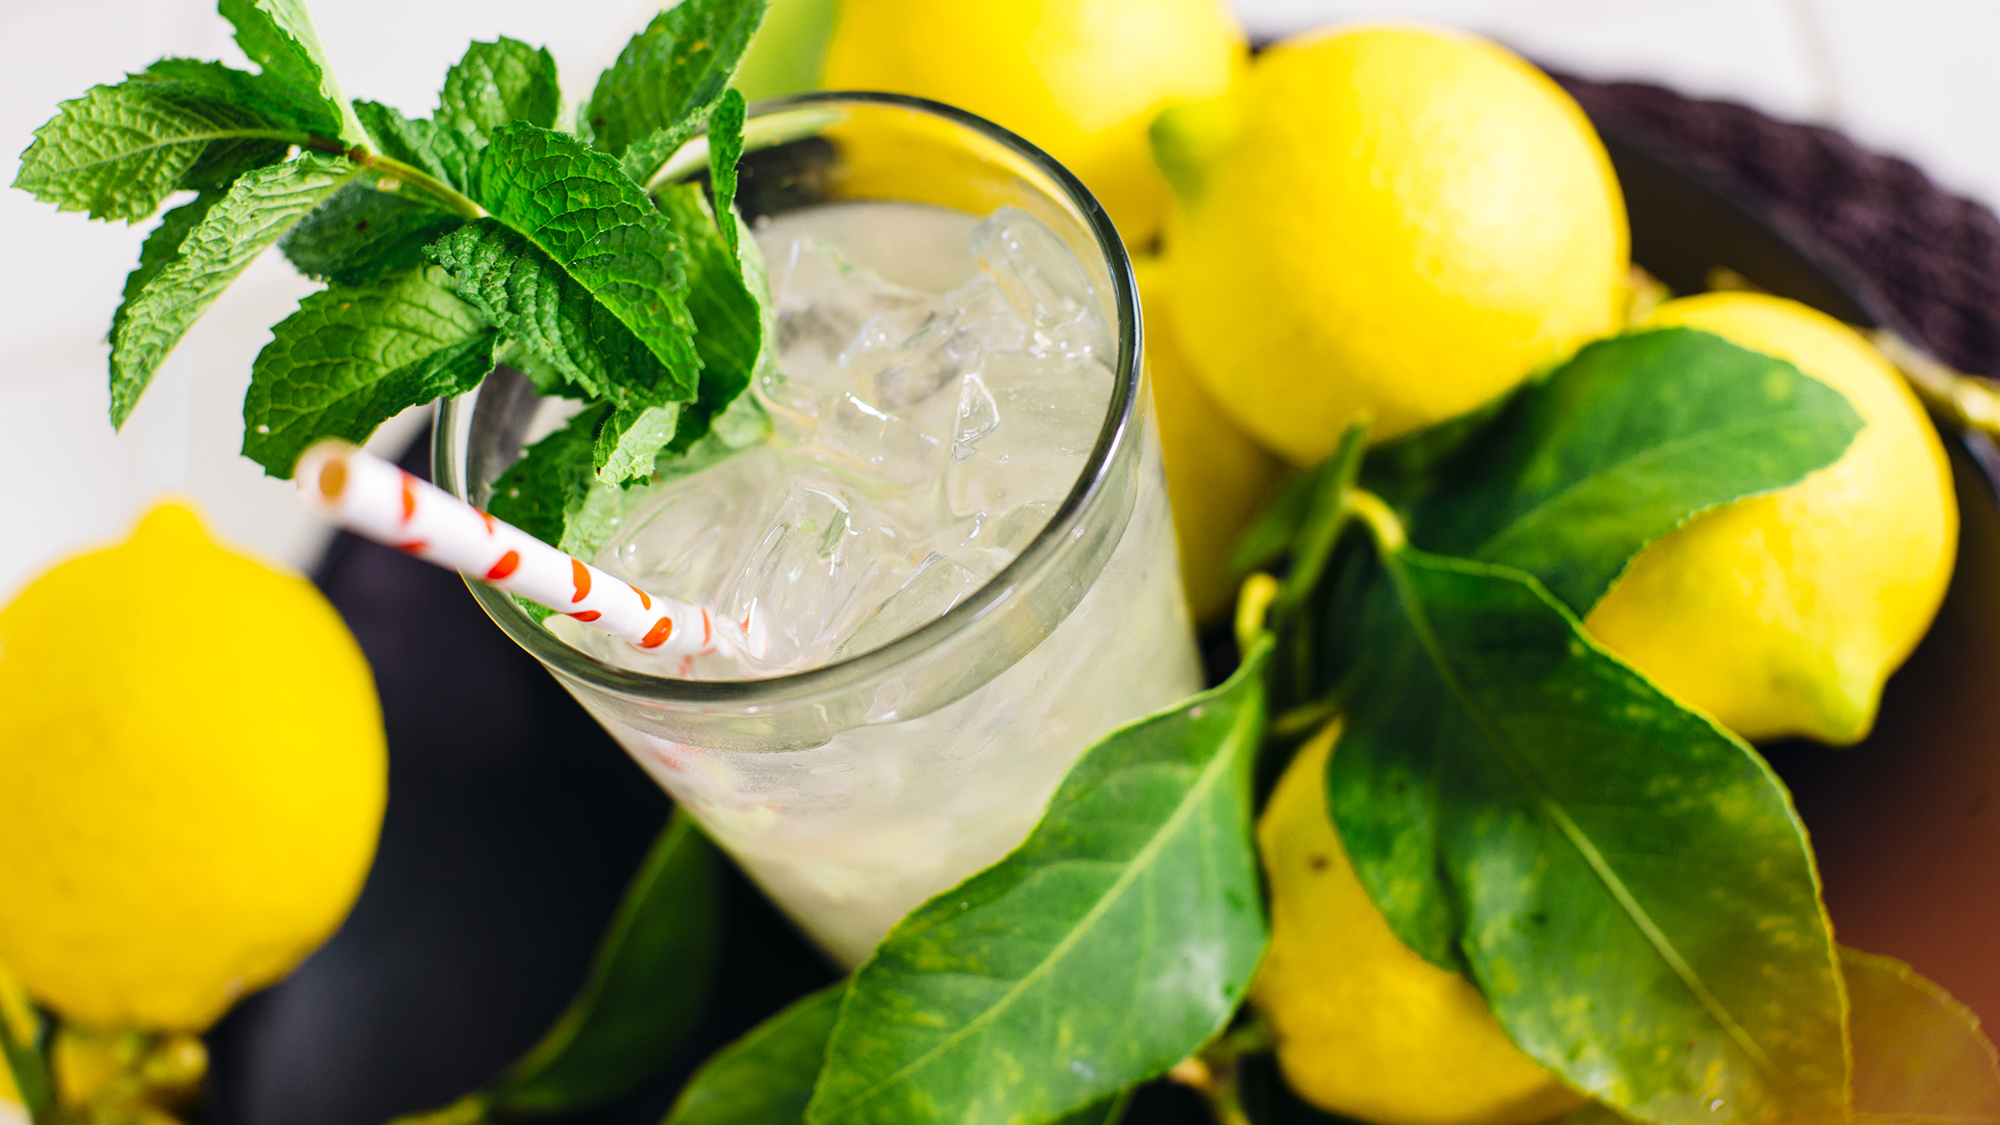 Lemonade Thumbnail No Logo Resized.jpg